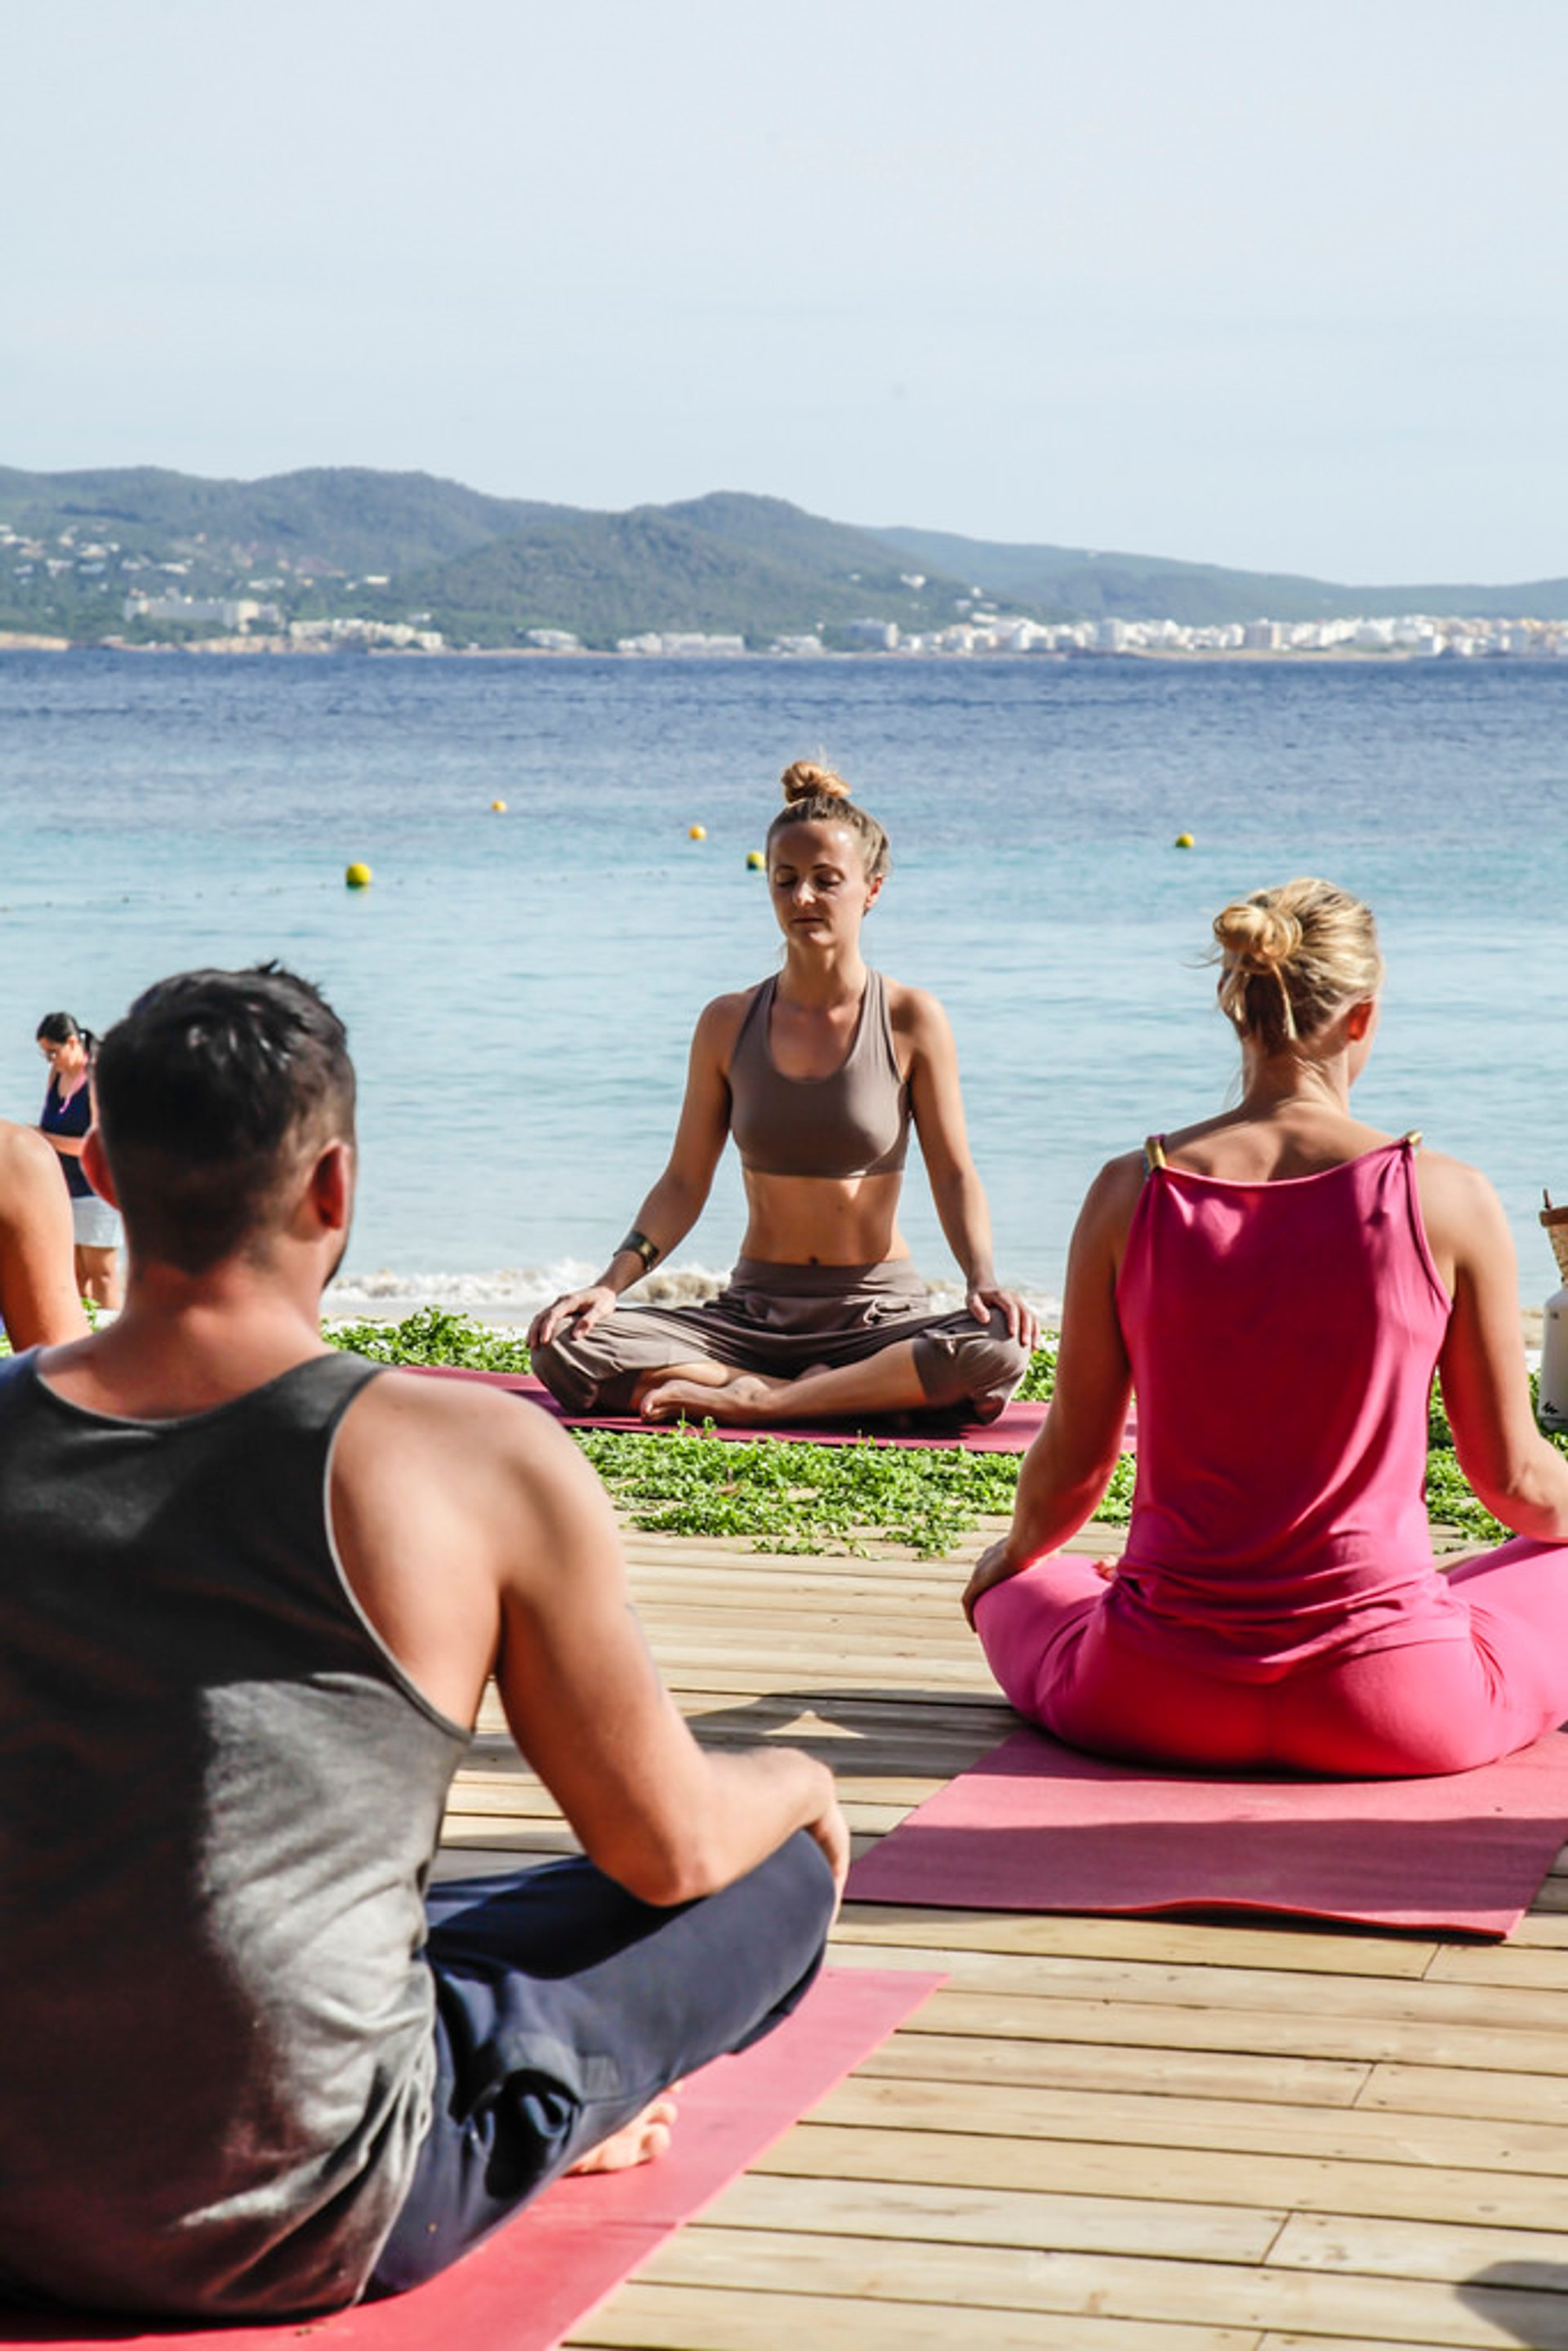 Energy Week Ibiza in Ibiza - Best Season 2020